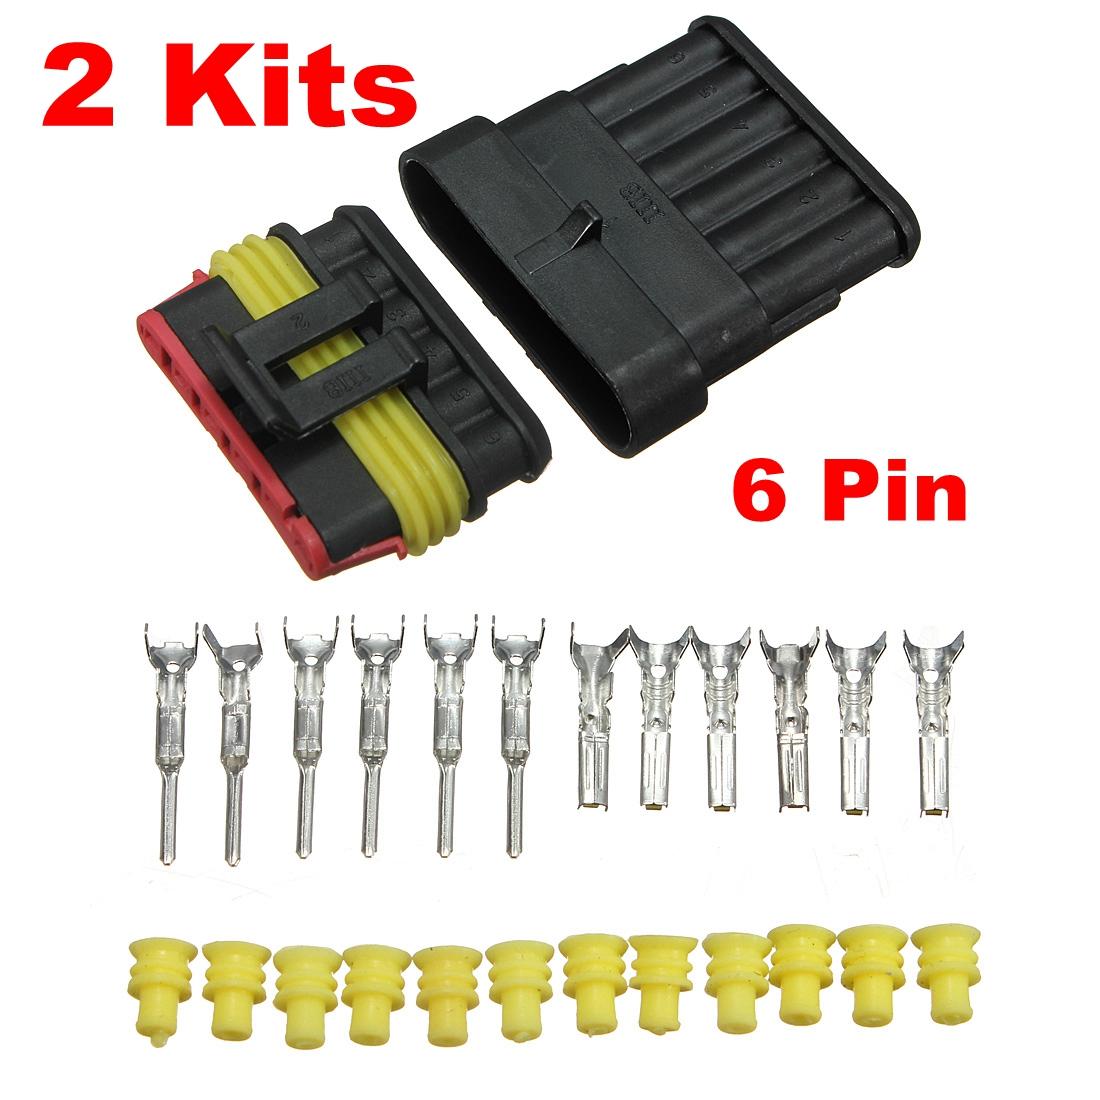 7 way connector kits 6 Pin Trailer Tow Wiring